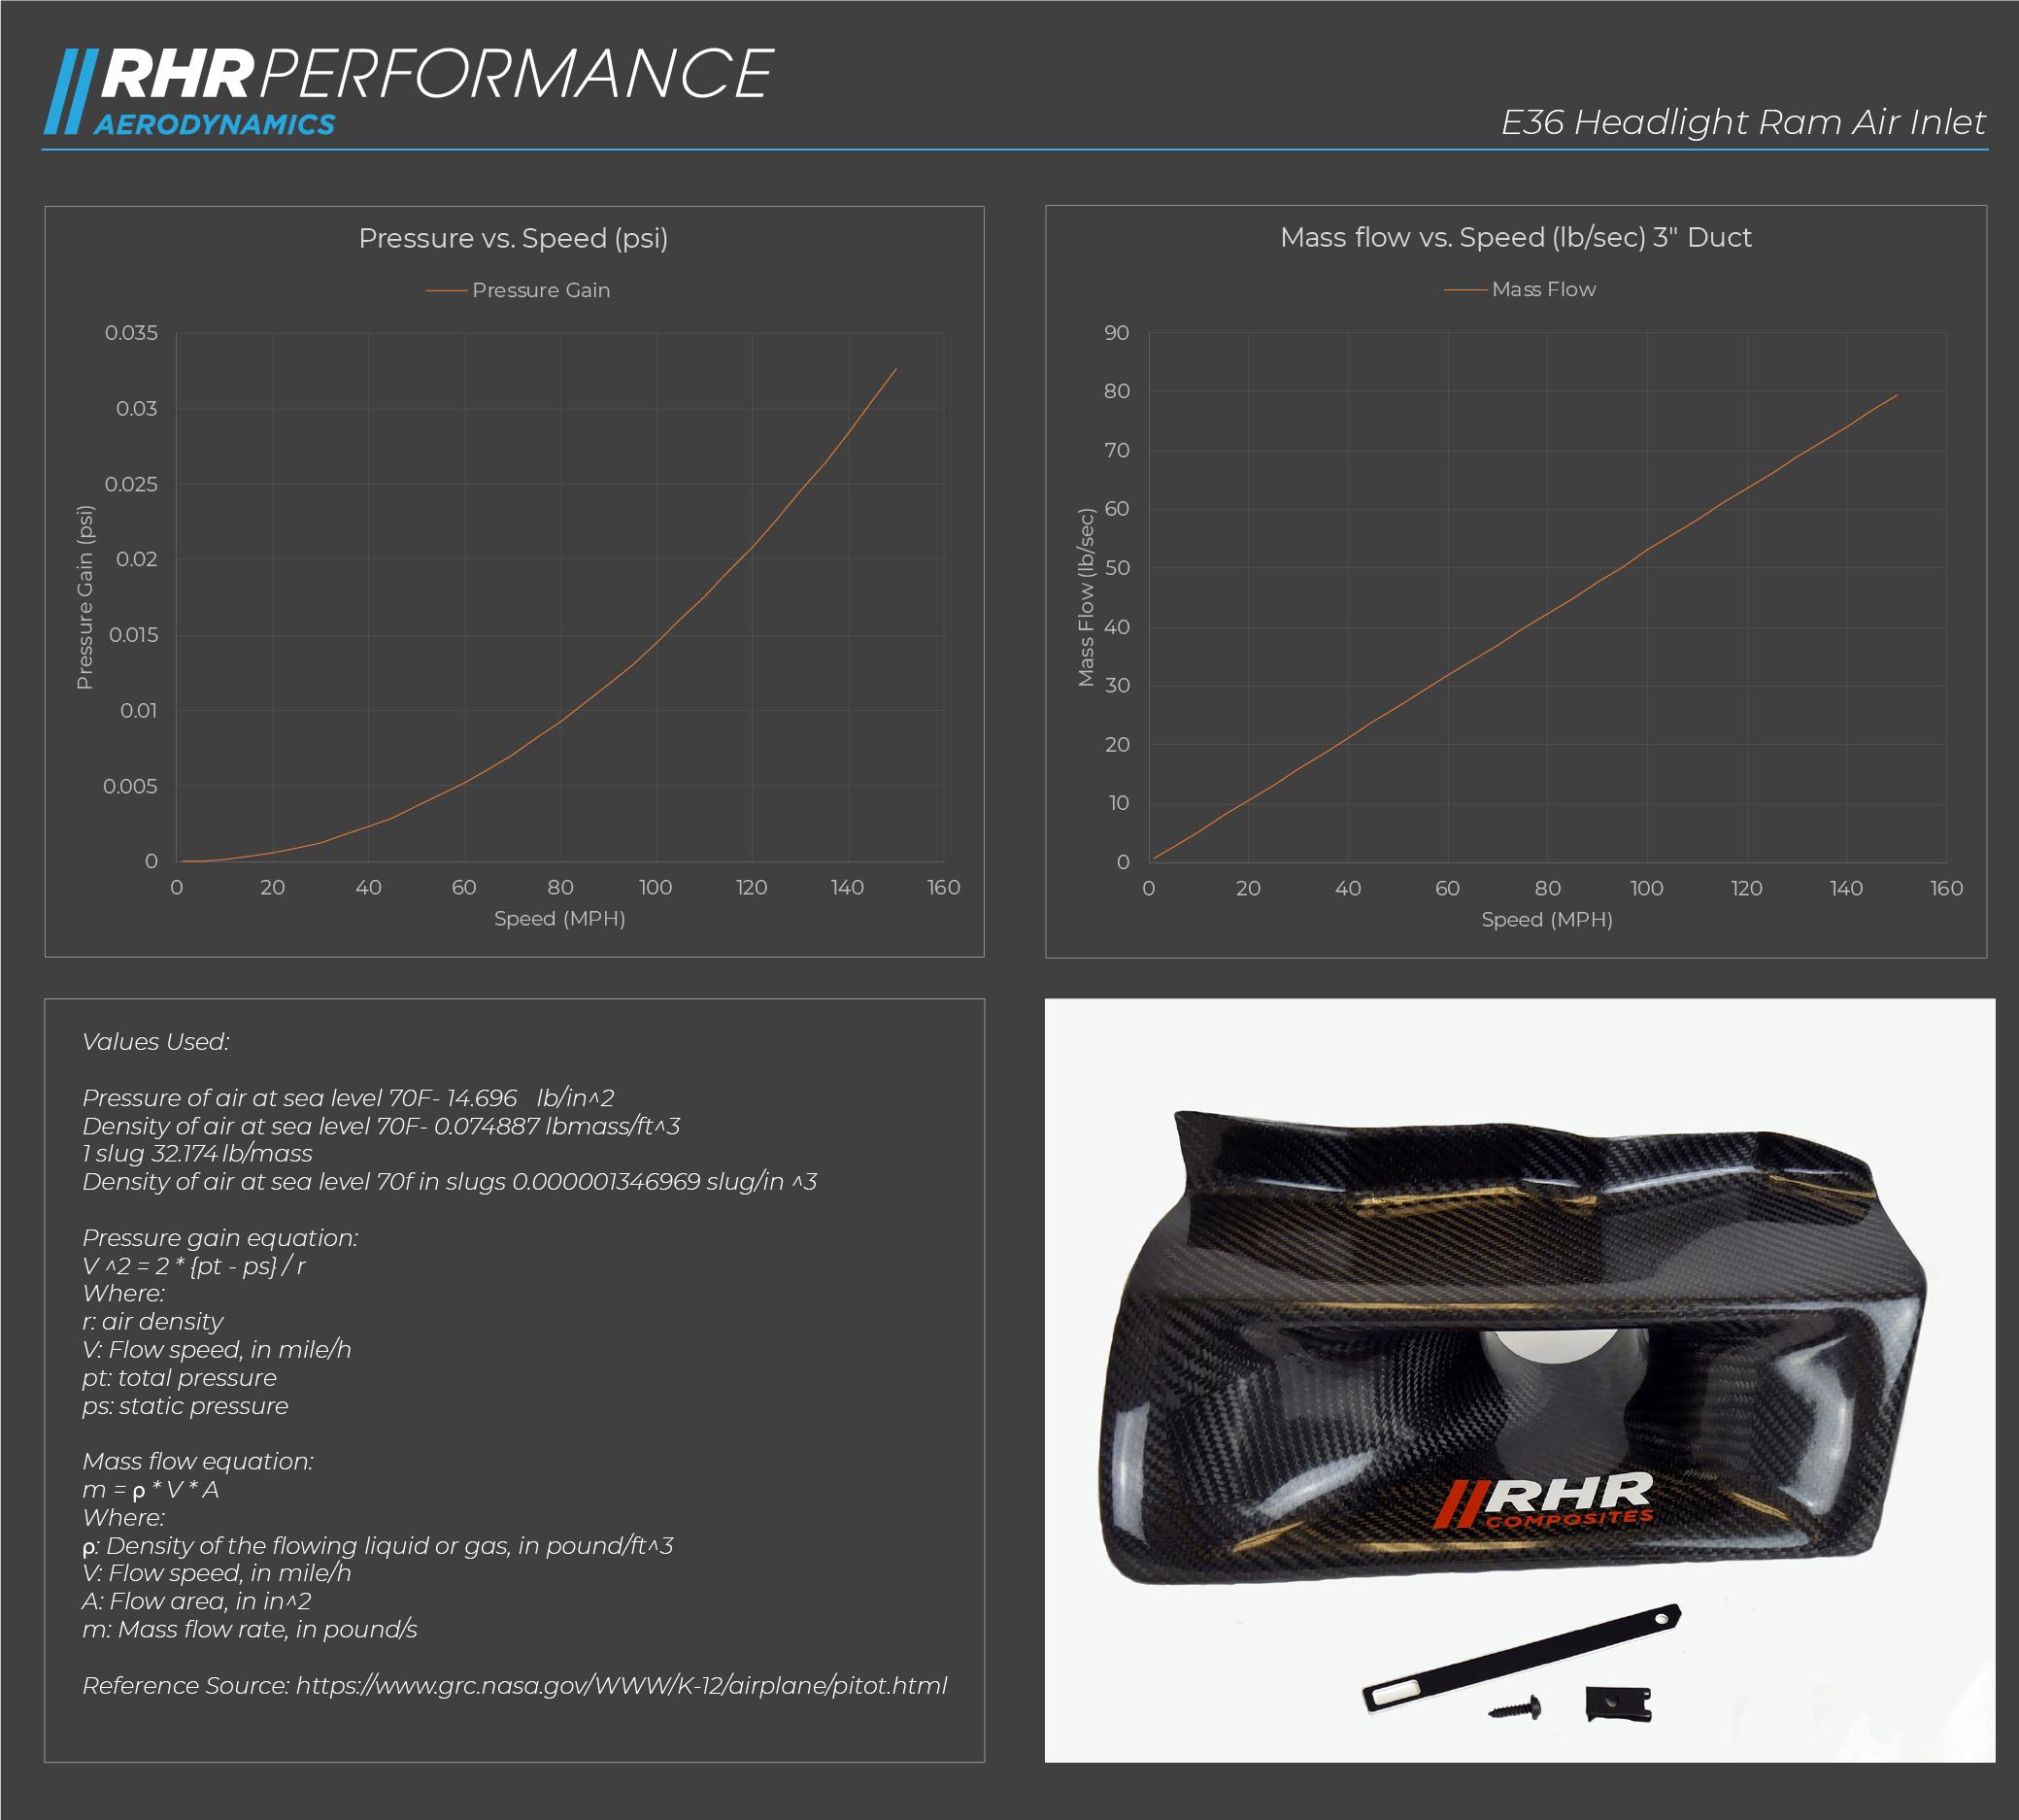 E36 Headlight Ram Air Data | RHR Performance